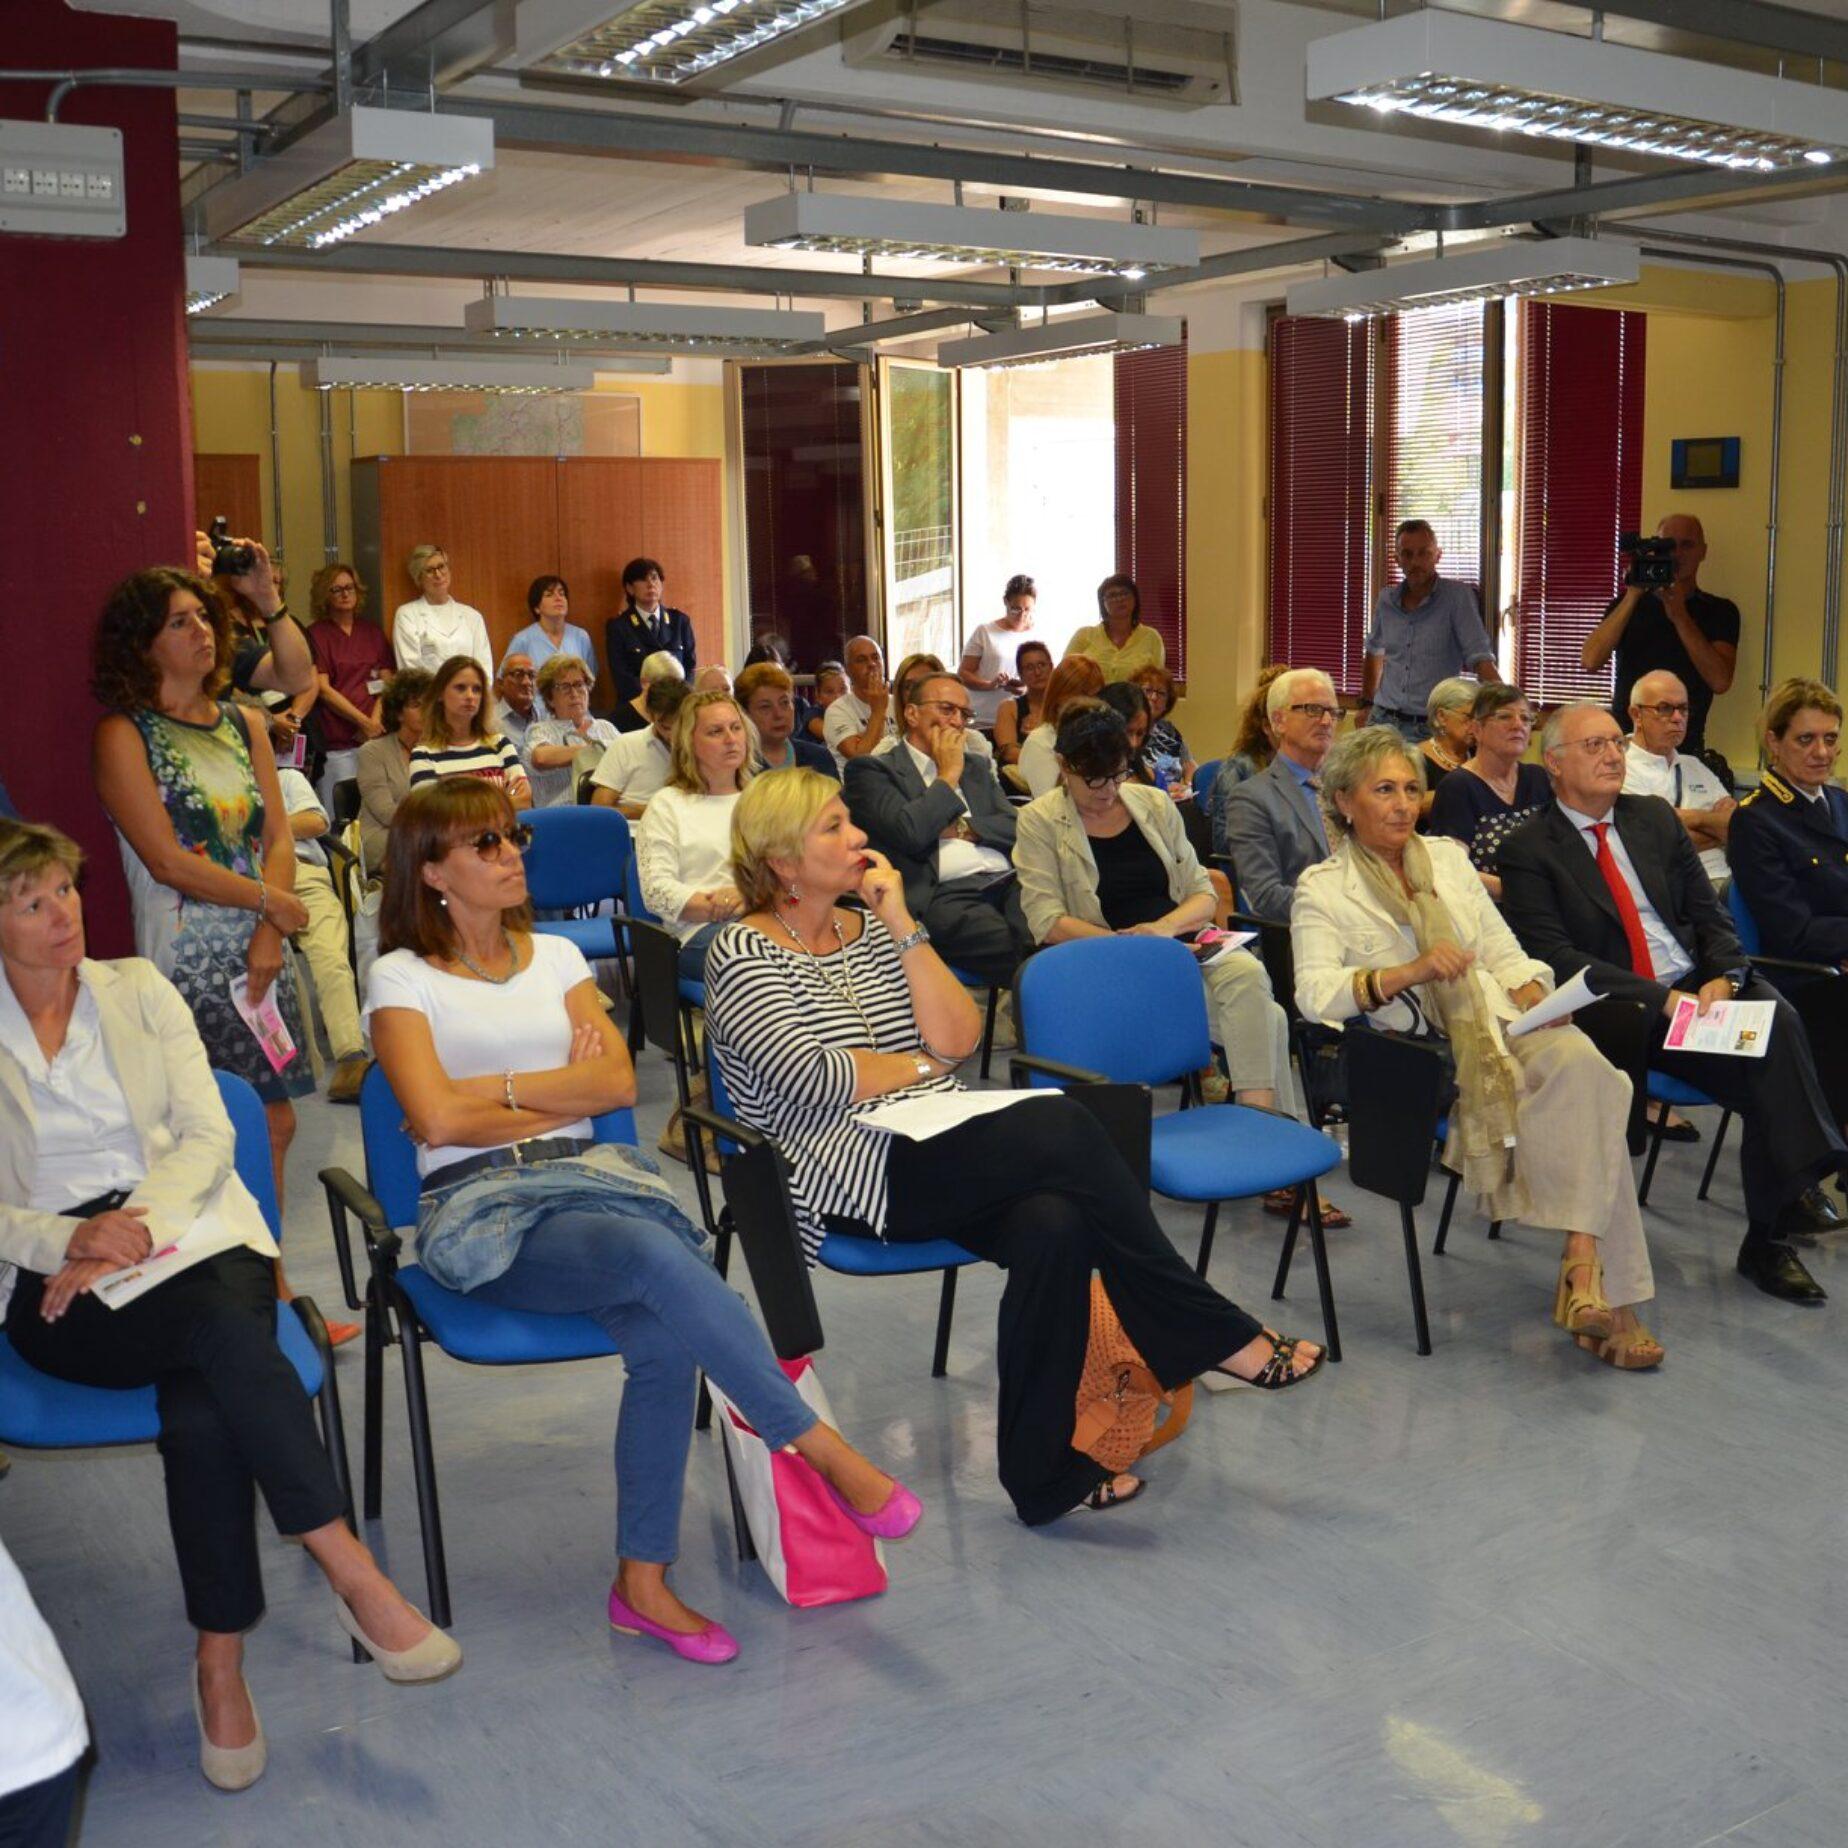 AVIS-Comunale-Verbania_Camera-Rosa-Ospedale-Castelli-Verbania (5)